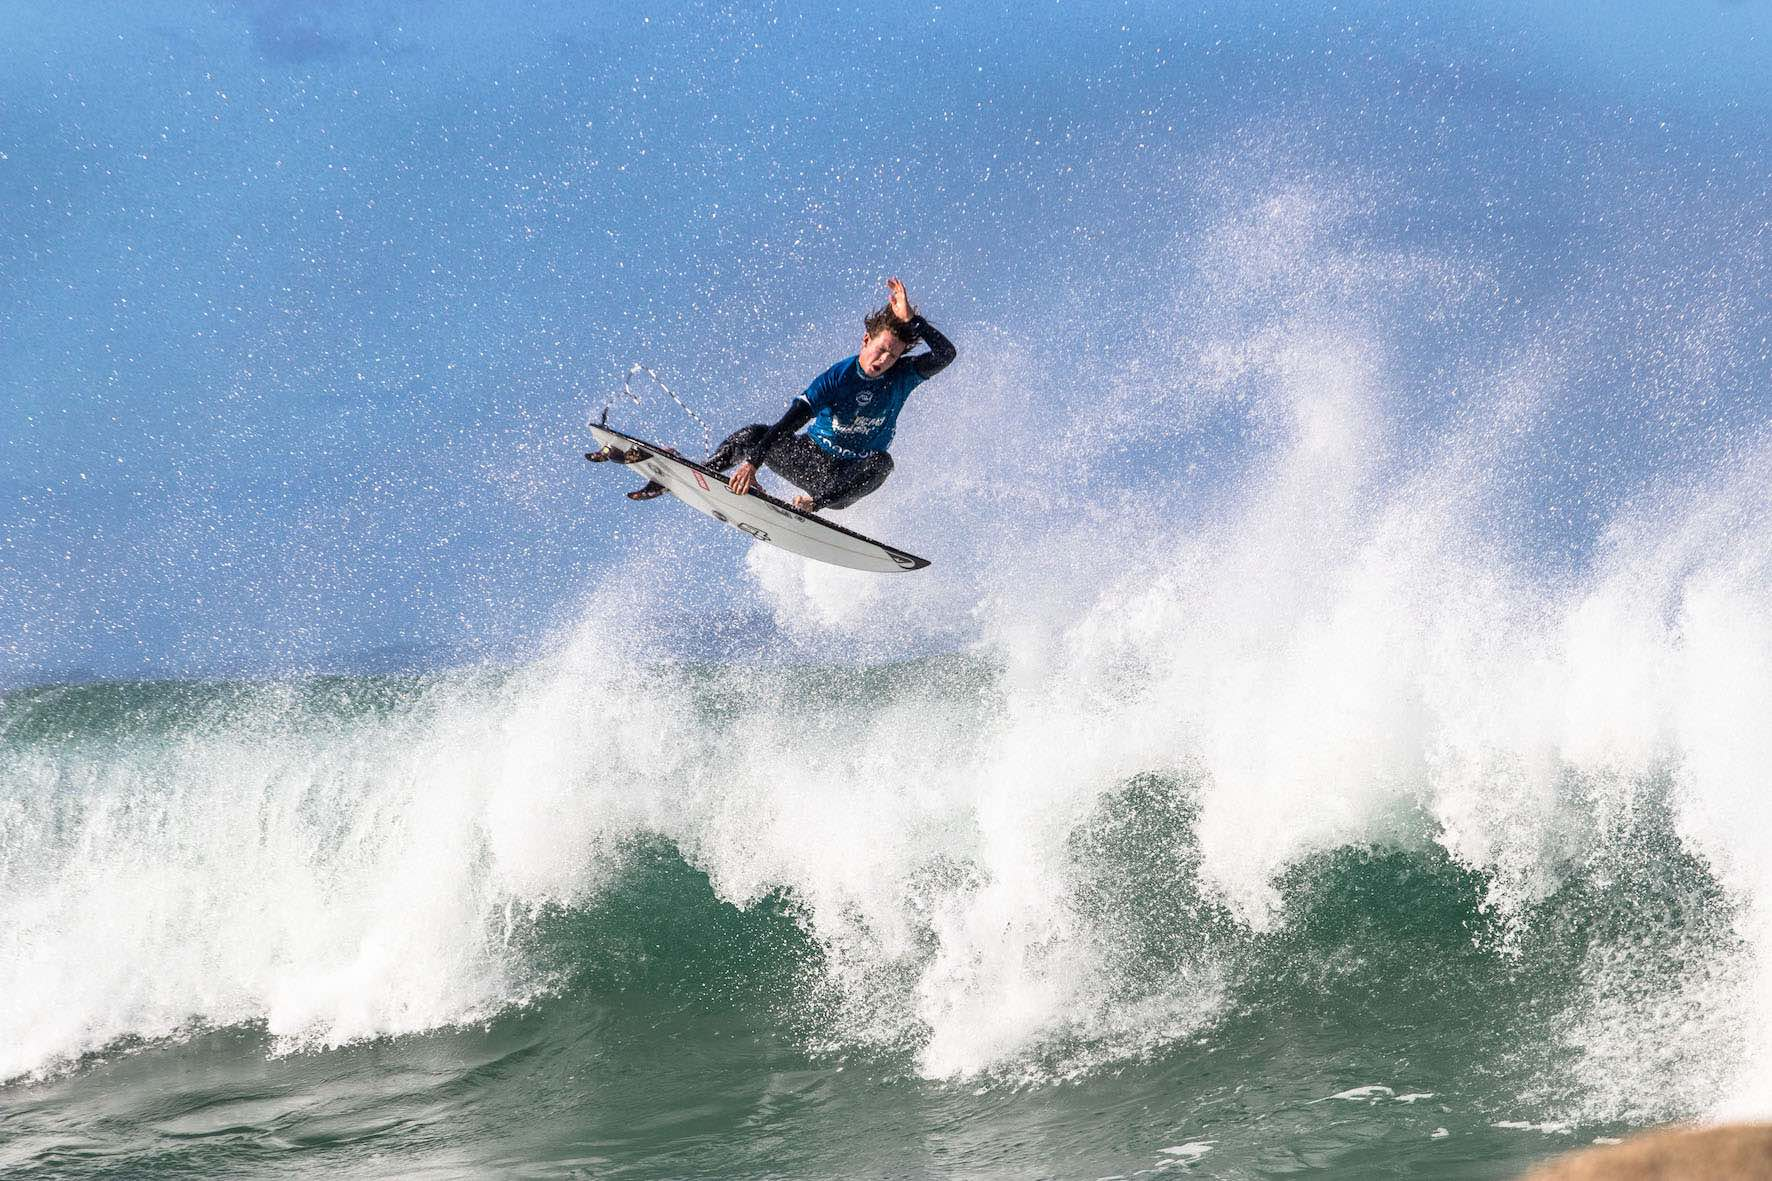 Luke Slijpen surfing in the 2019 Vic Bay Classic